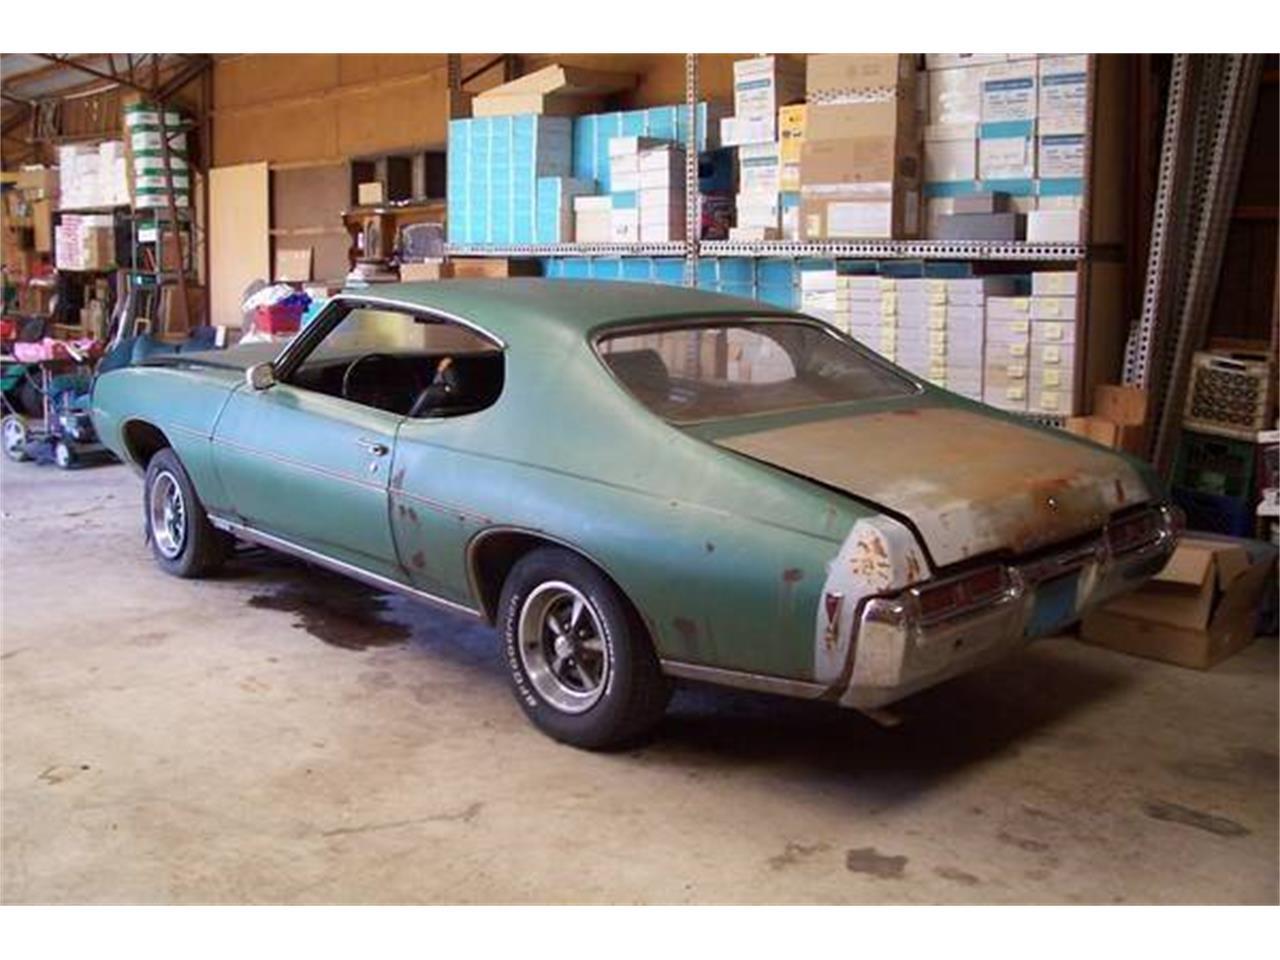 For Sale: 1969 Pontiac LeMans in Long Island, New York